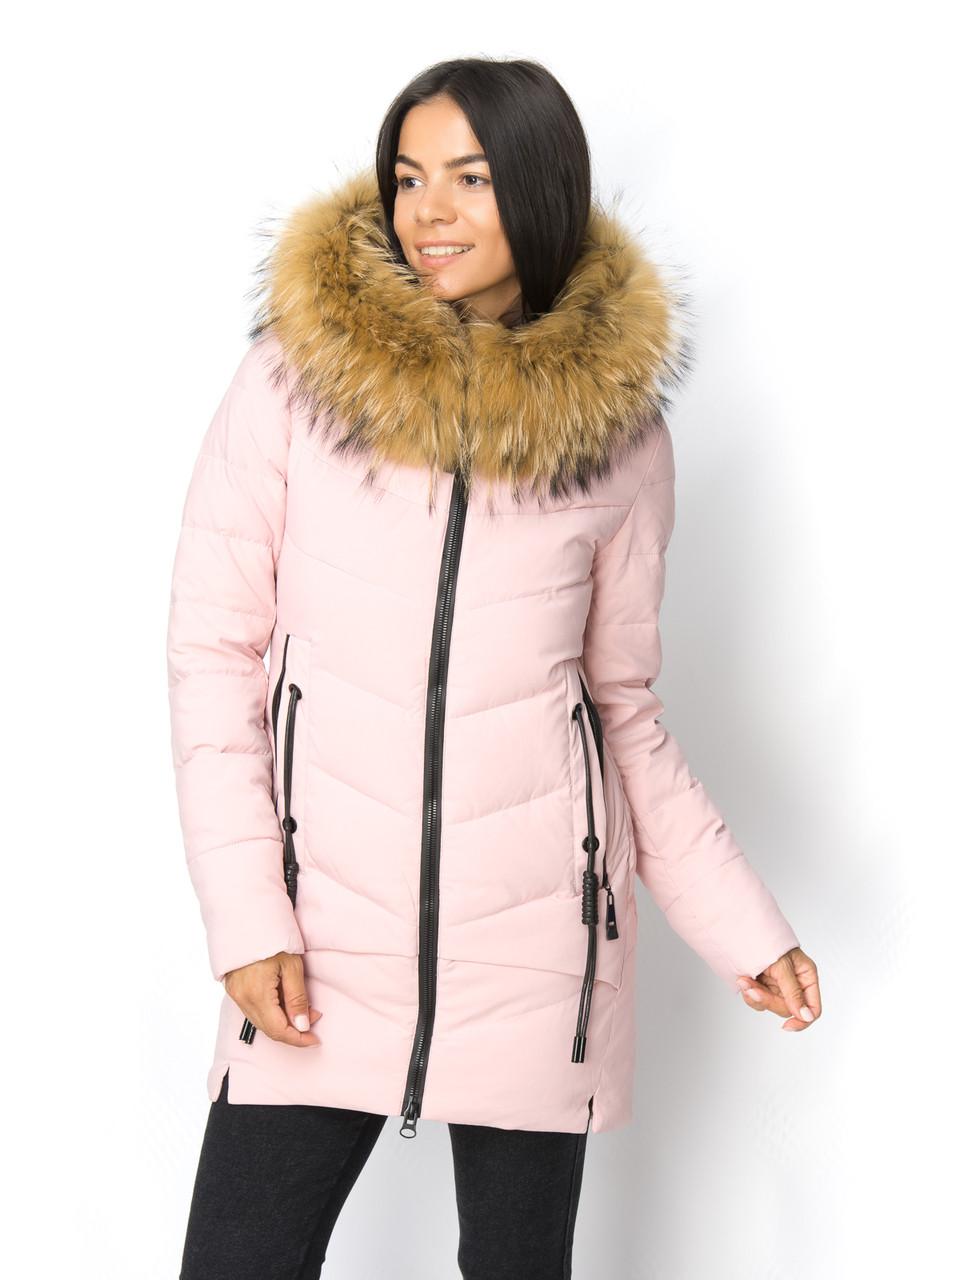 2c2ff4fc2a2 Молодежная женская куртка с мехом енота представлен в каталоге ...